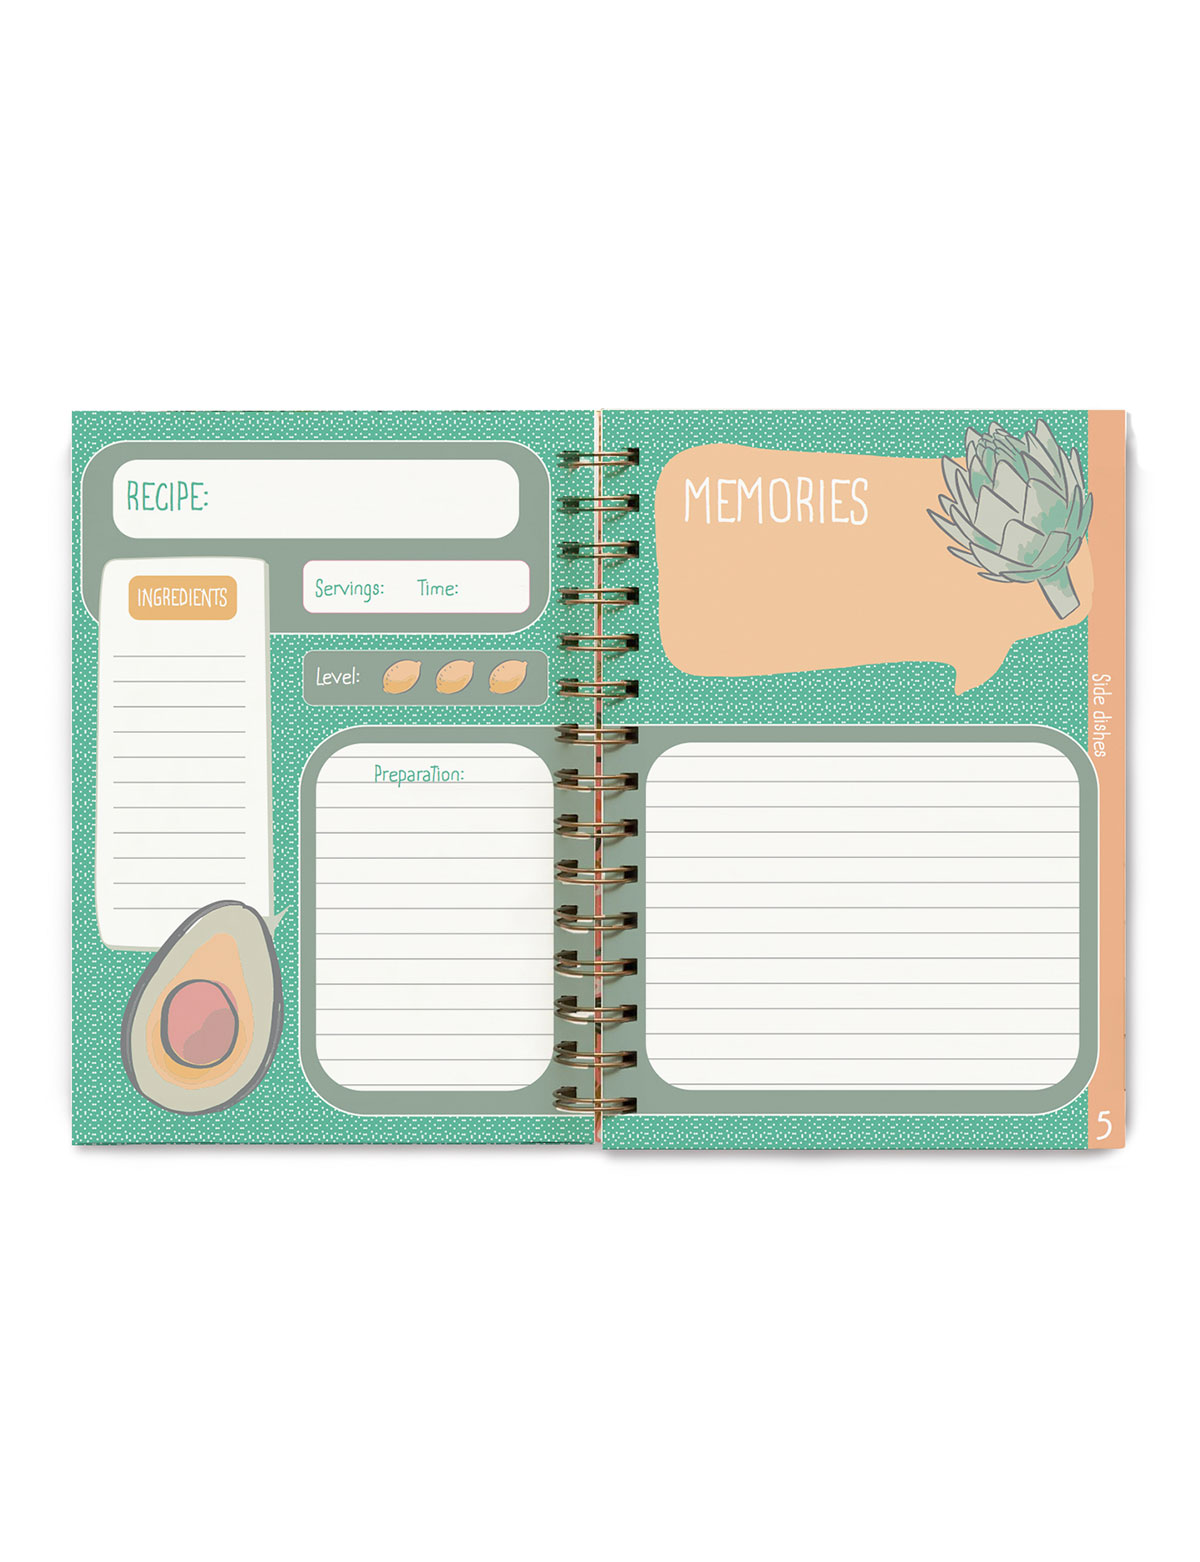 İngilizce Tarif Defteri - Recipe Notebook